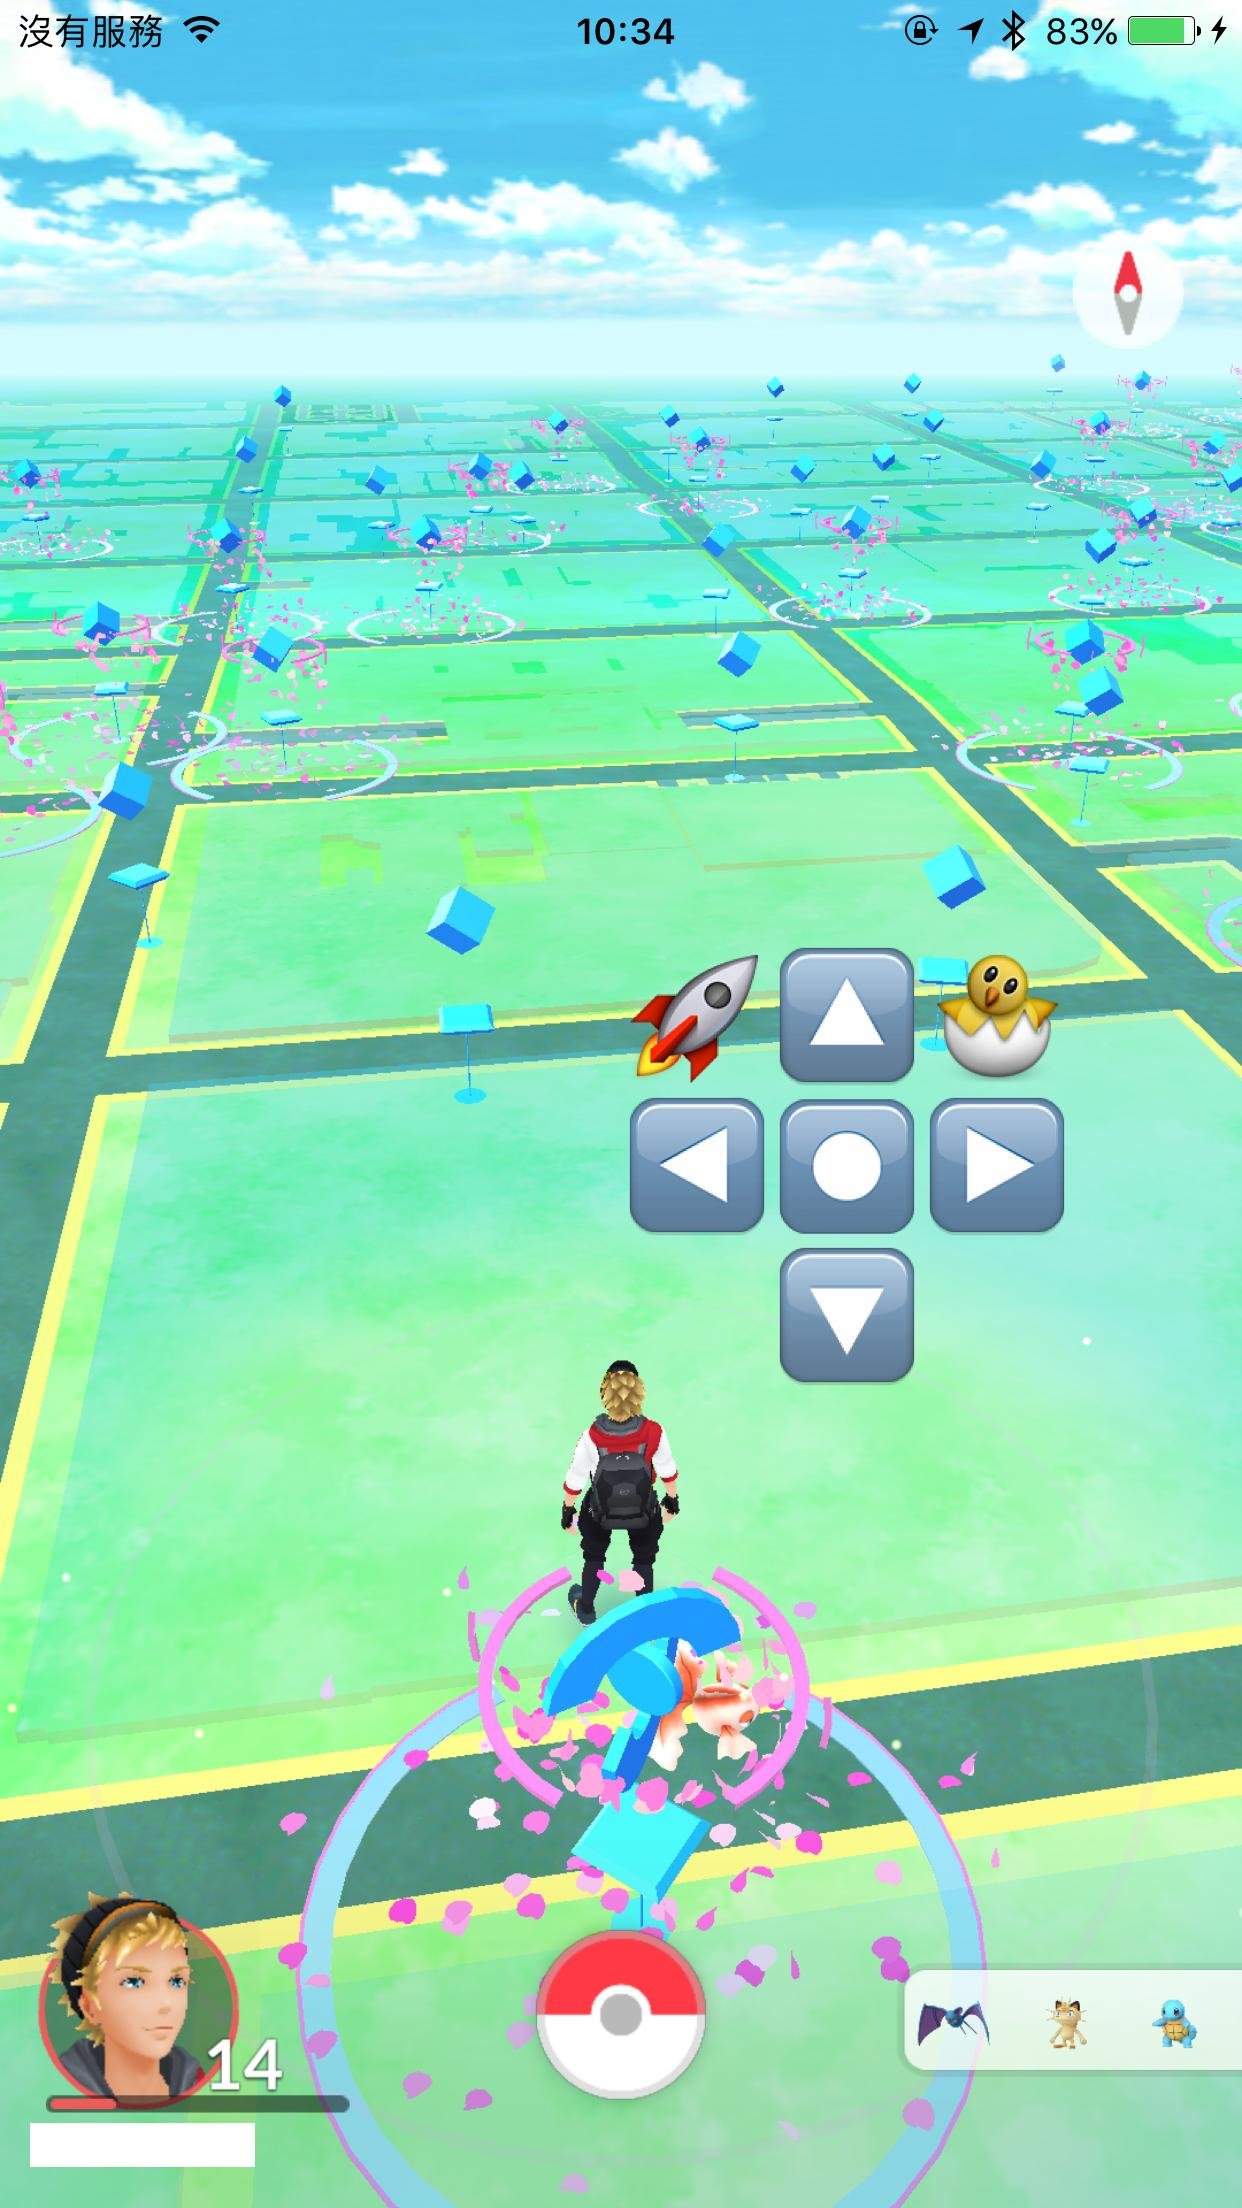 [IOS][越獄/沒越獄/兩版都有] 懶人版PokemonGo Lazy Fatter【Pokemon GO 精靈寶可夢】夢遊電玩論壇 - GAME735.COM